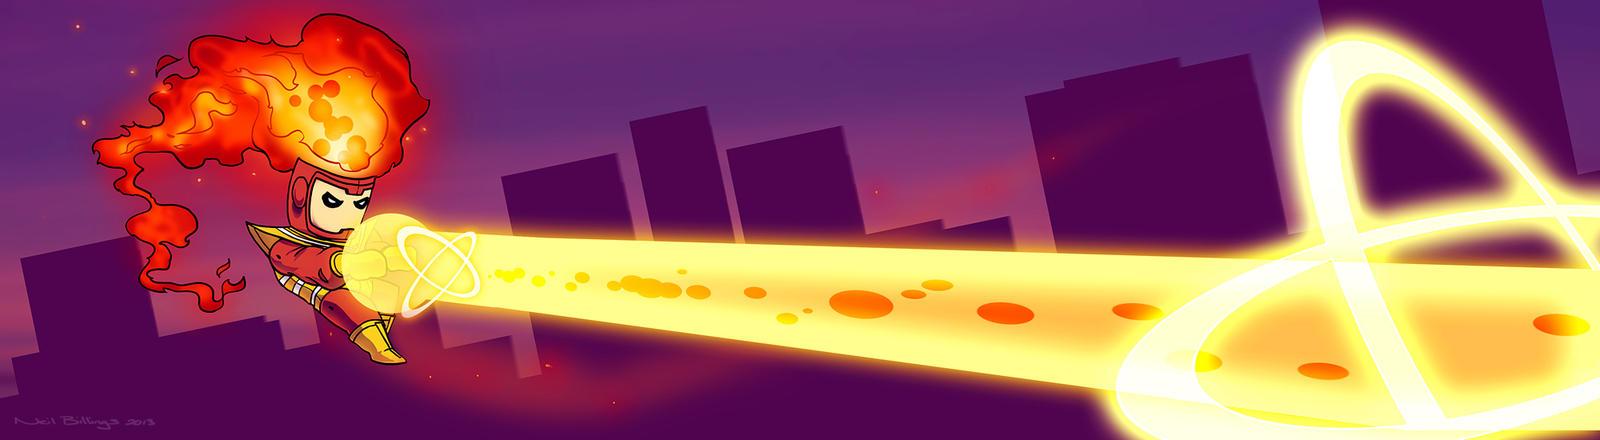 Firestorm, The Nuclear Man by Bladien